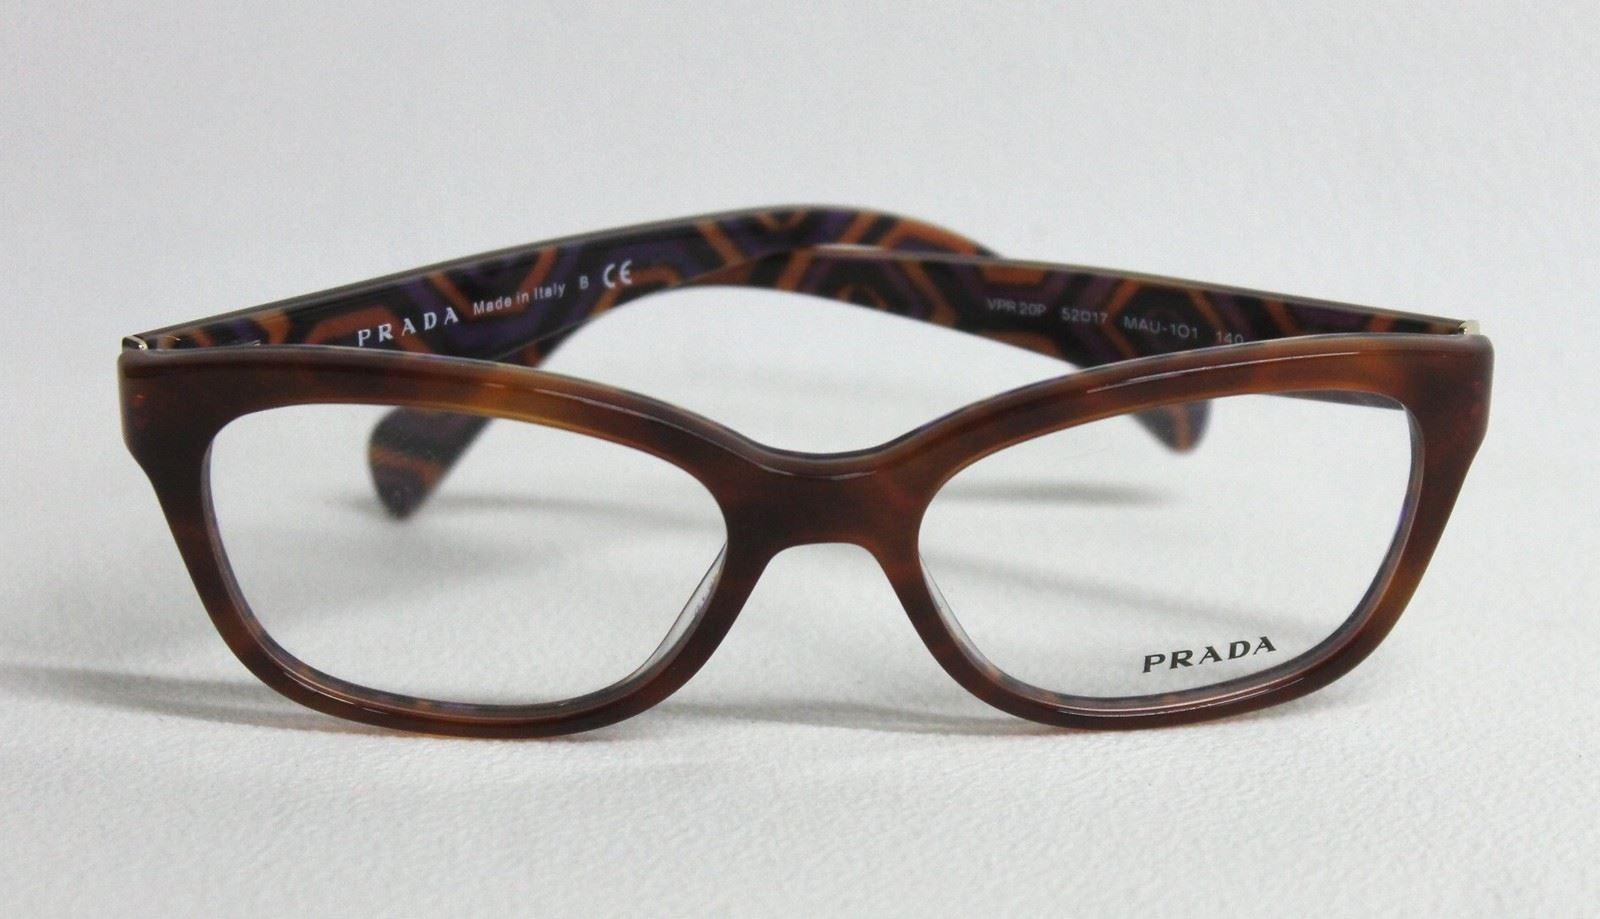 new prada vpr 20p mau 101 s brown wayfarer frame